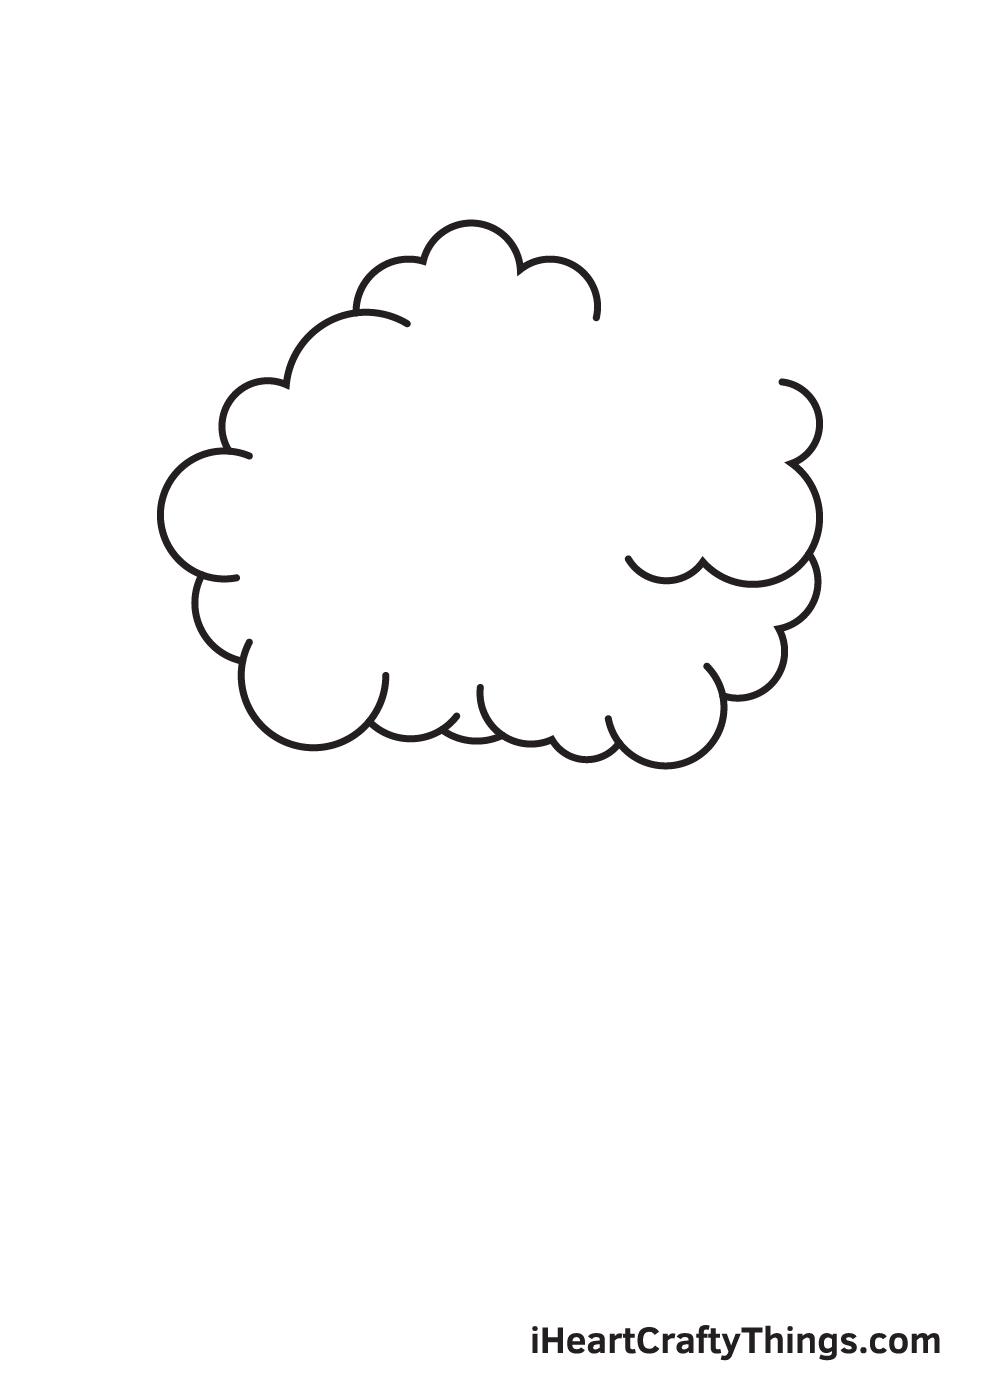 tree drawing step 7